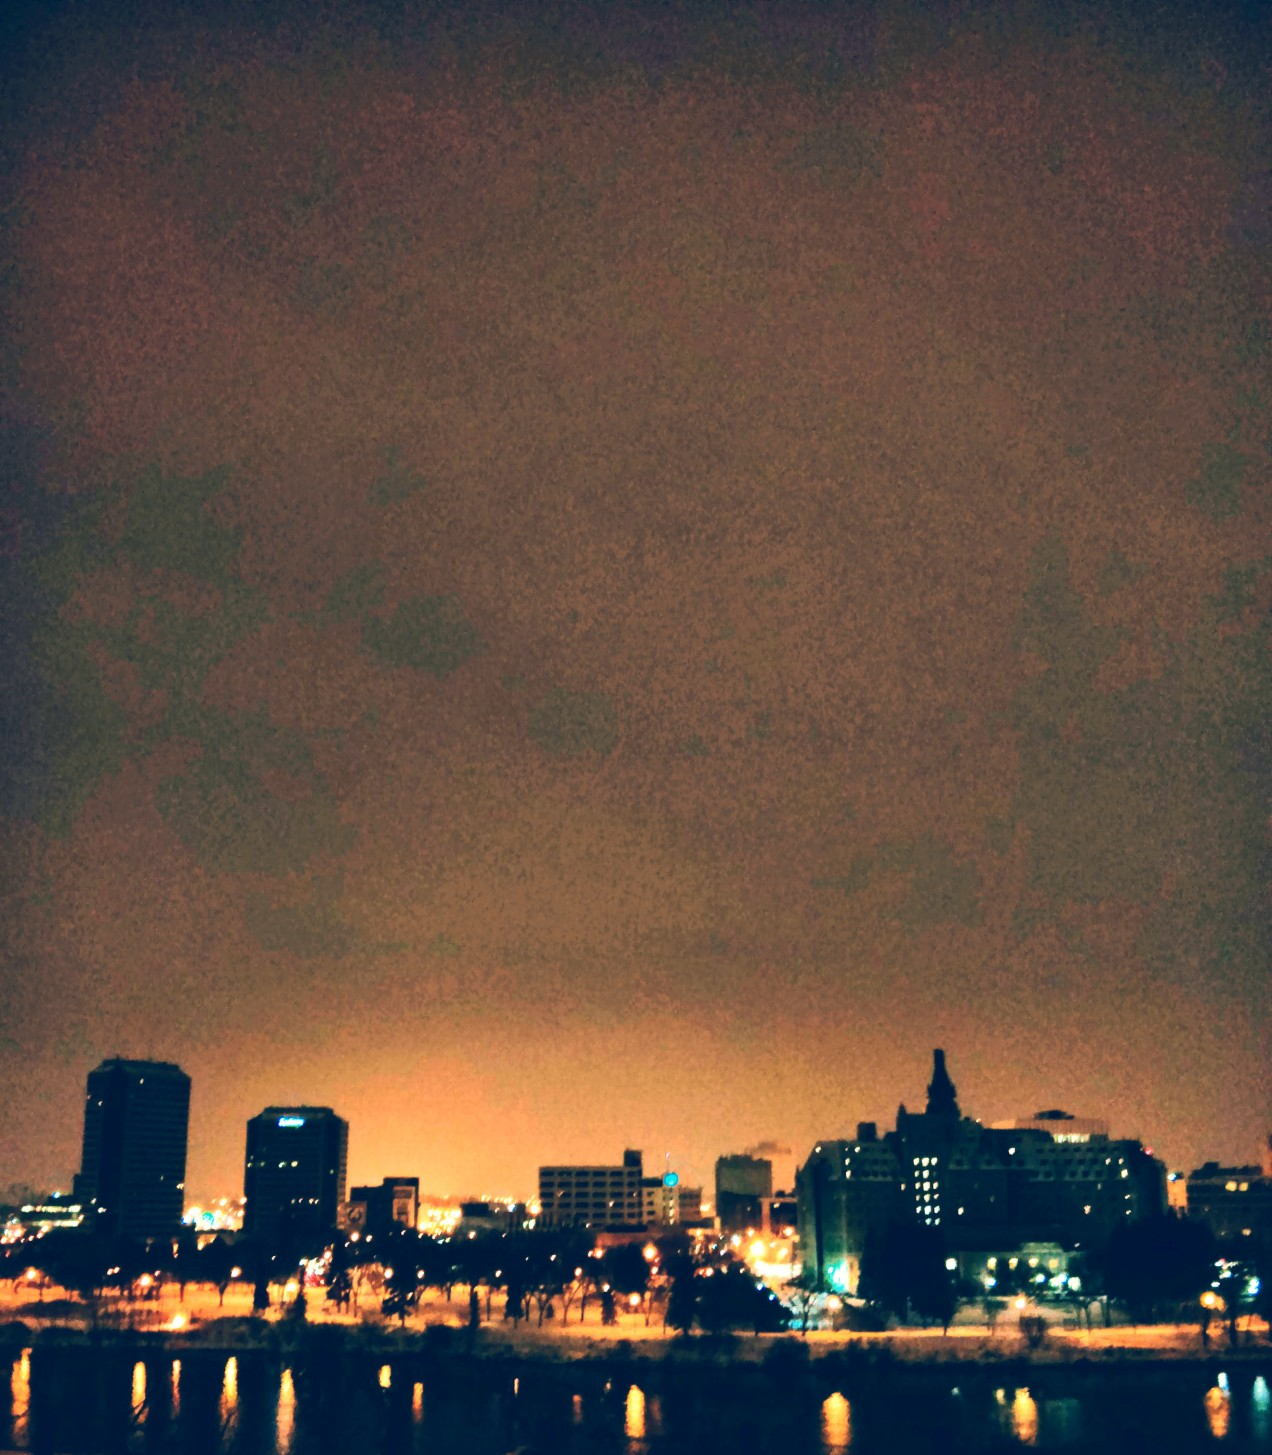 Winter Nightscape